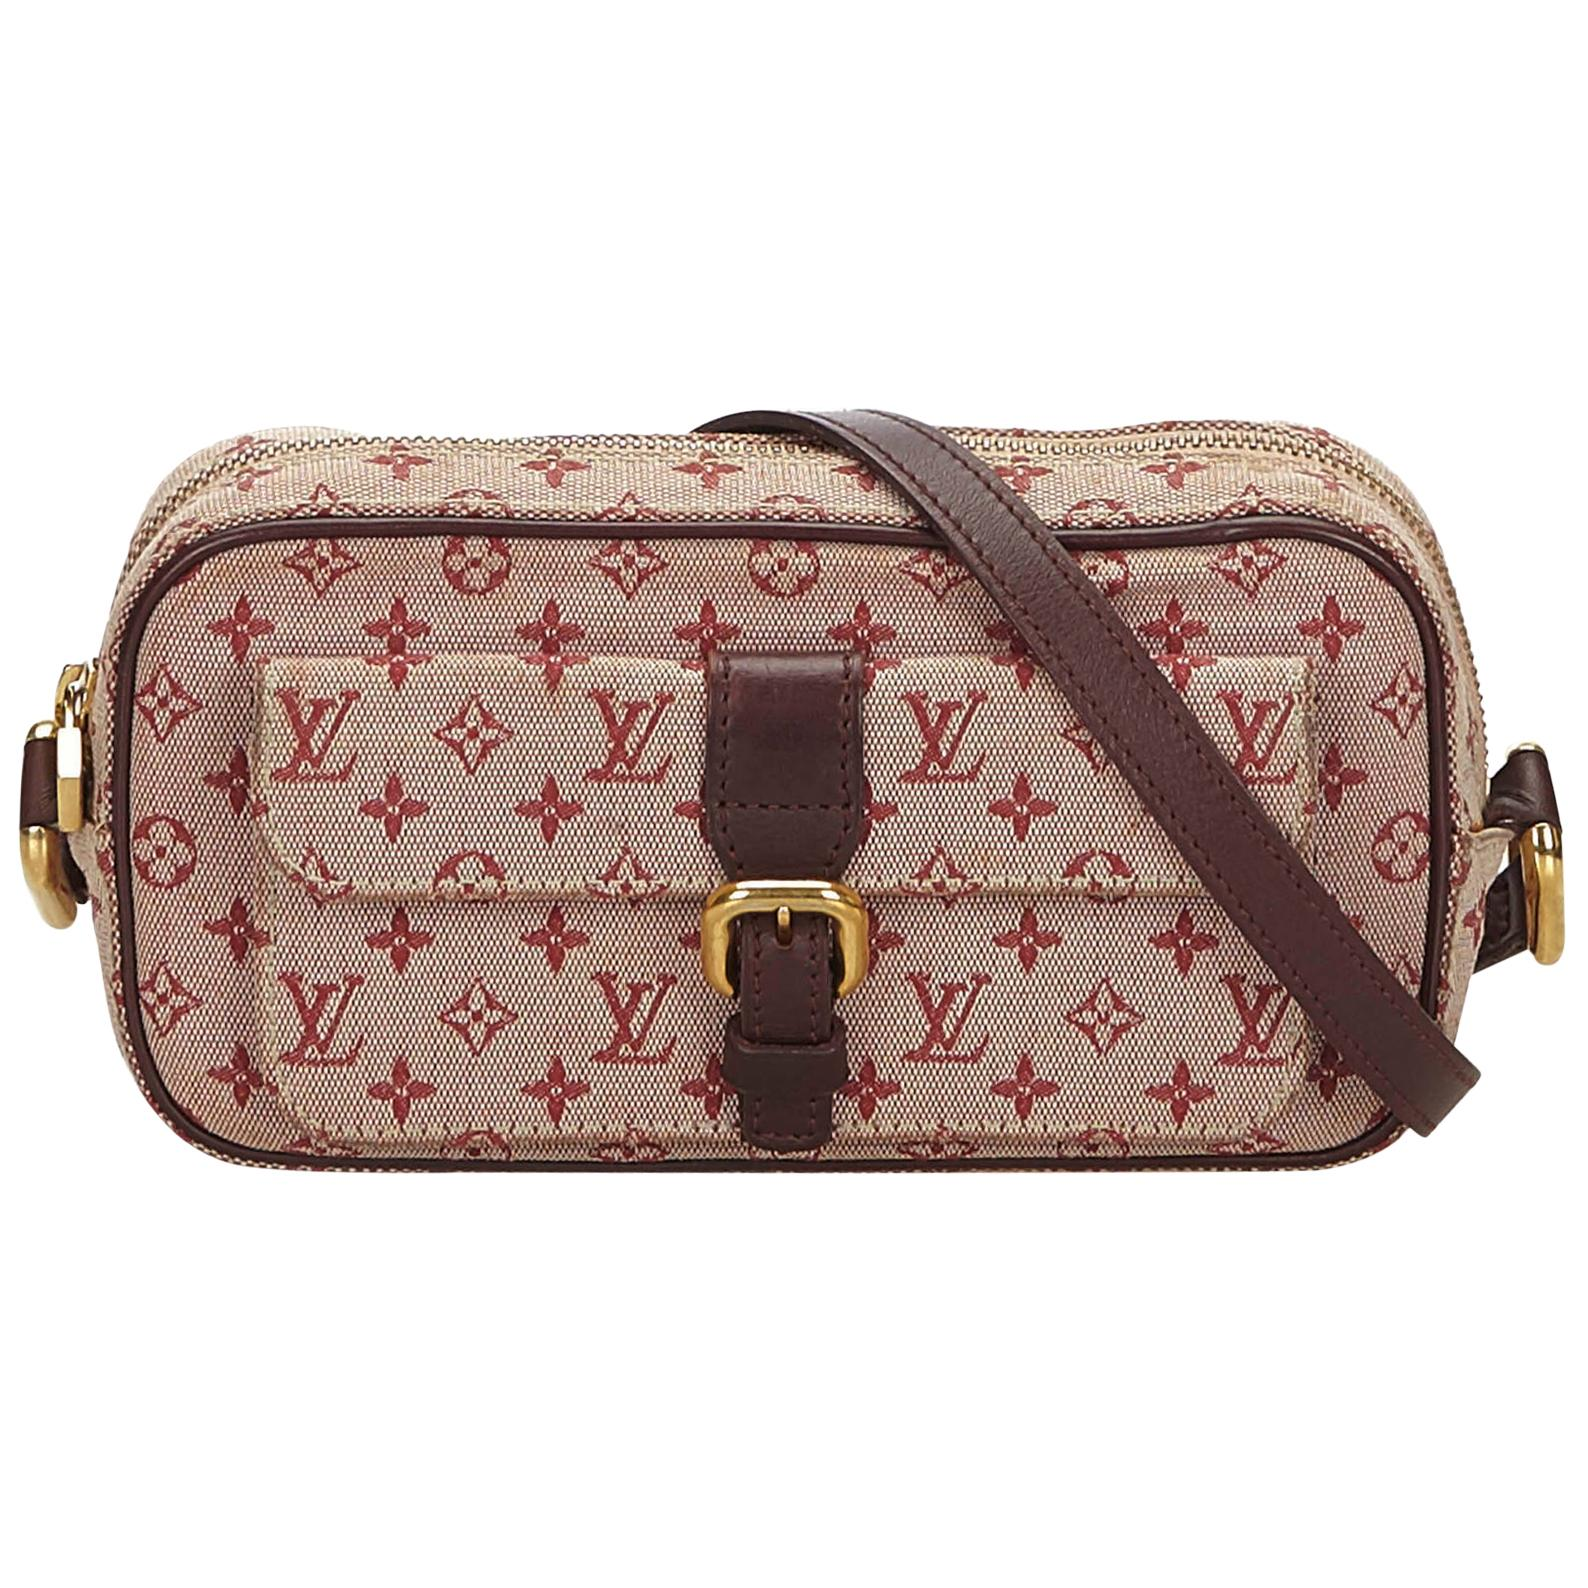 Louis Vuitton Mini Lin Bags - 35 For Sale on 1stdibs 5872156f4c6e1